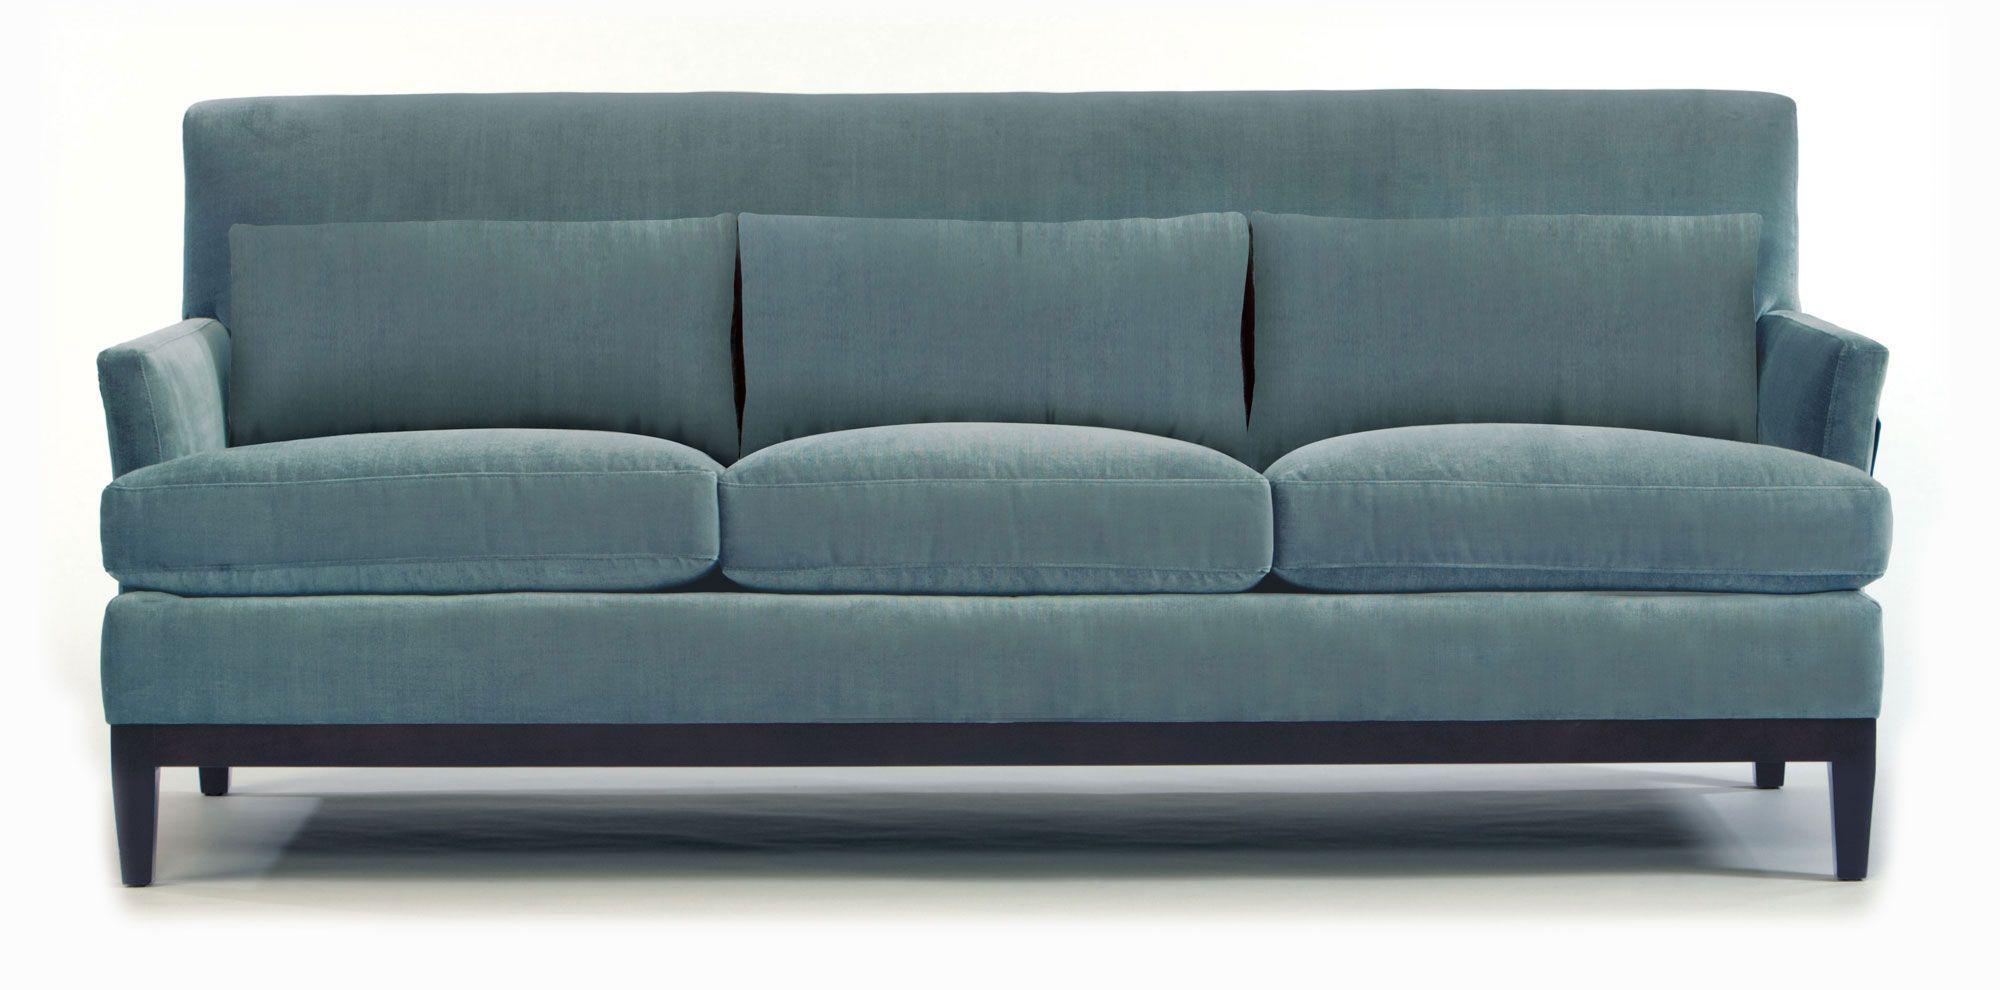 Bernhardt Interiors Sofa By Hospitality